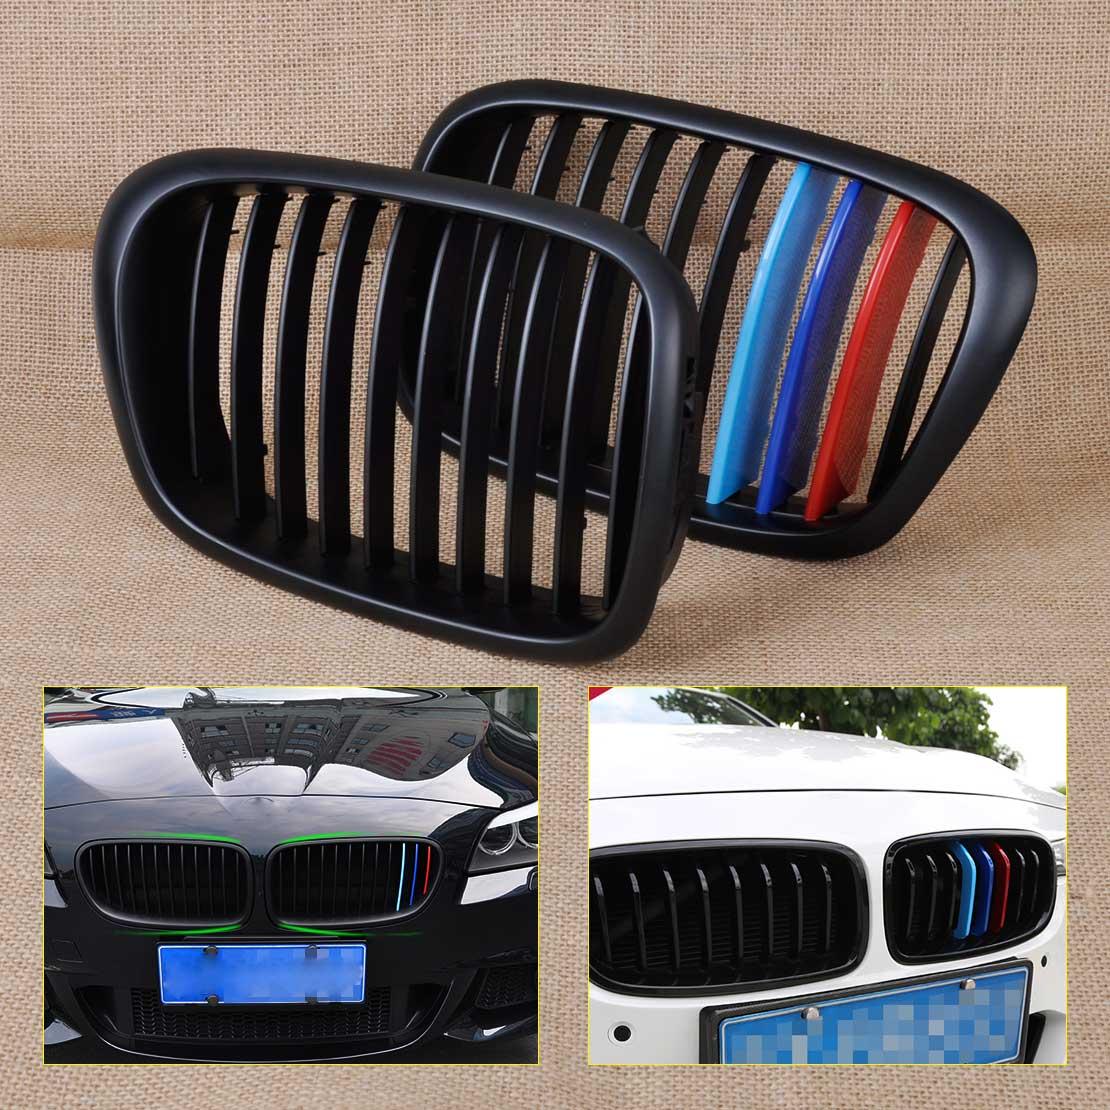 DWCX M Color Front Kidney Grille Grill for BMW 5 Series E39 525/528/530/535/540/M5 1995 -1997 1998 1999 2000 2001 2002 2003 2004